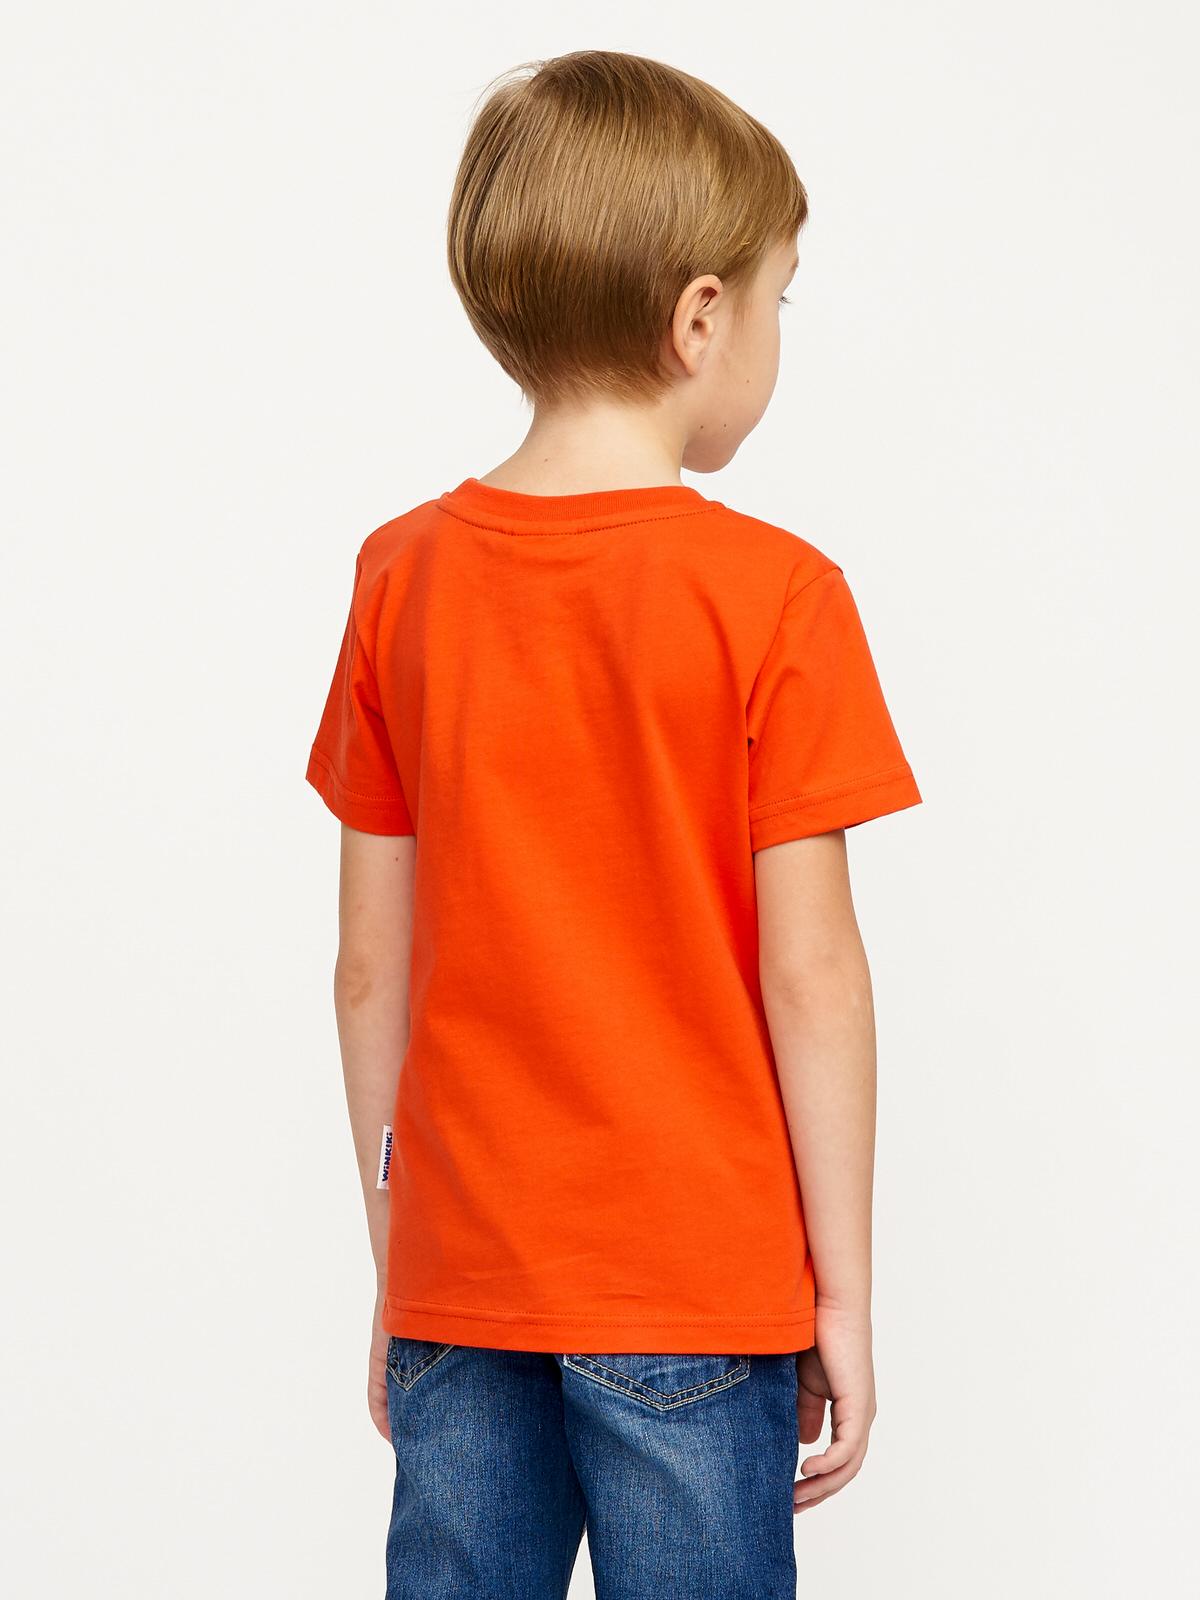 Chlapecké tričko Mosters Červená